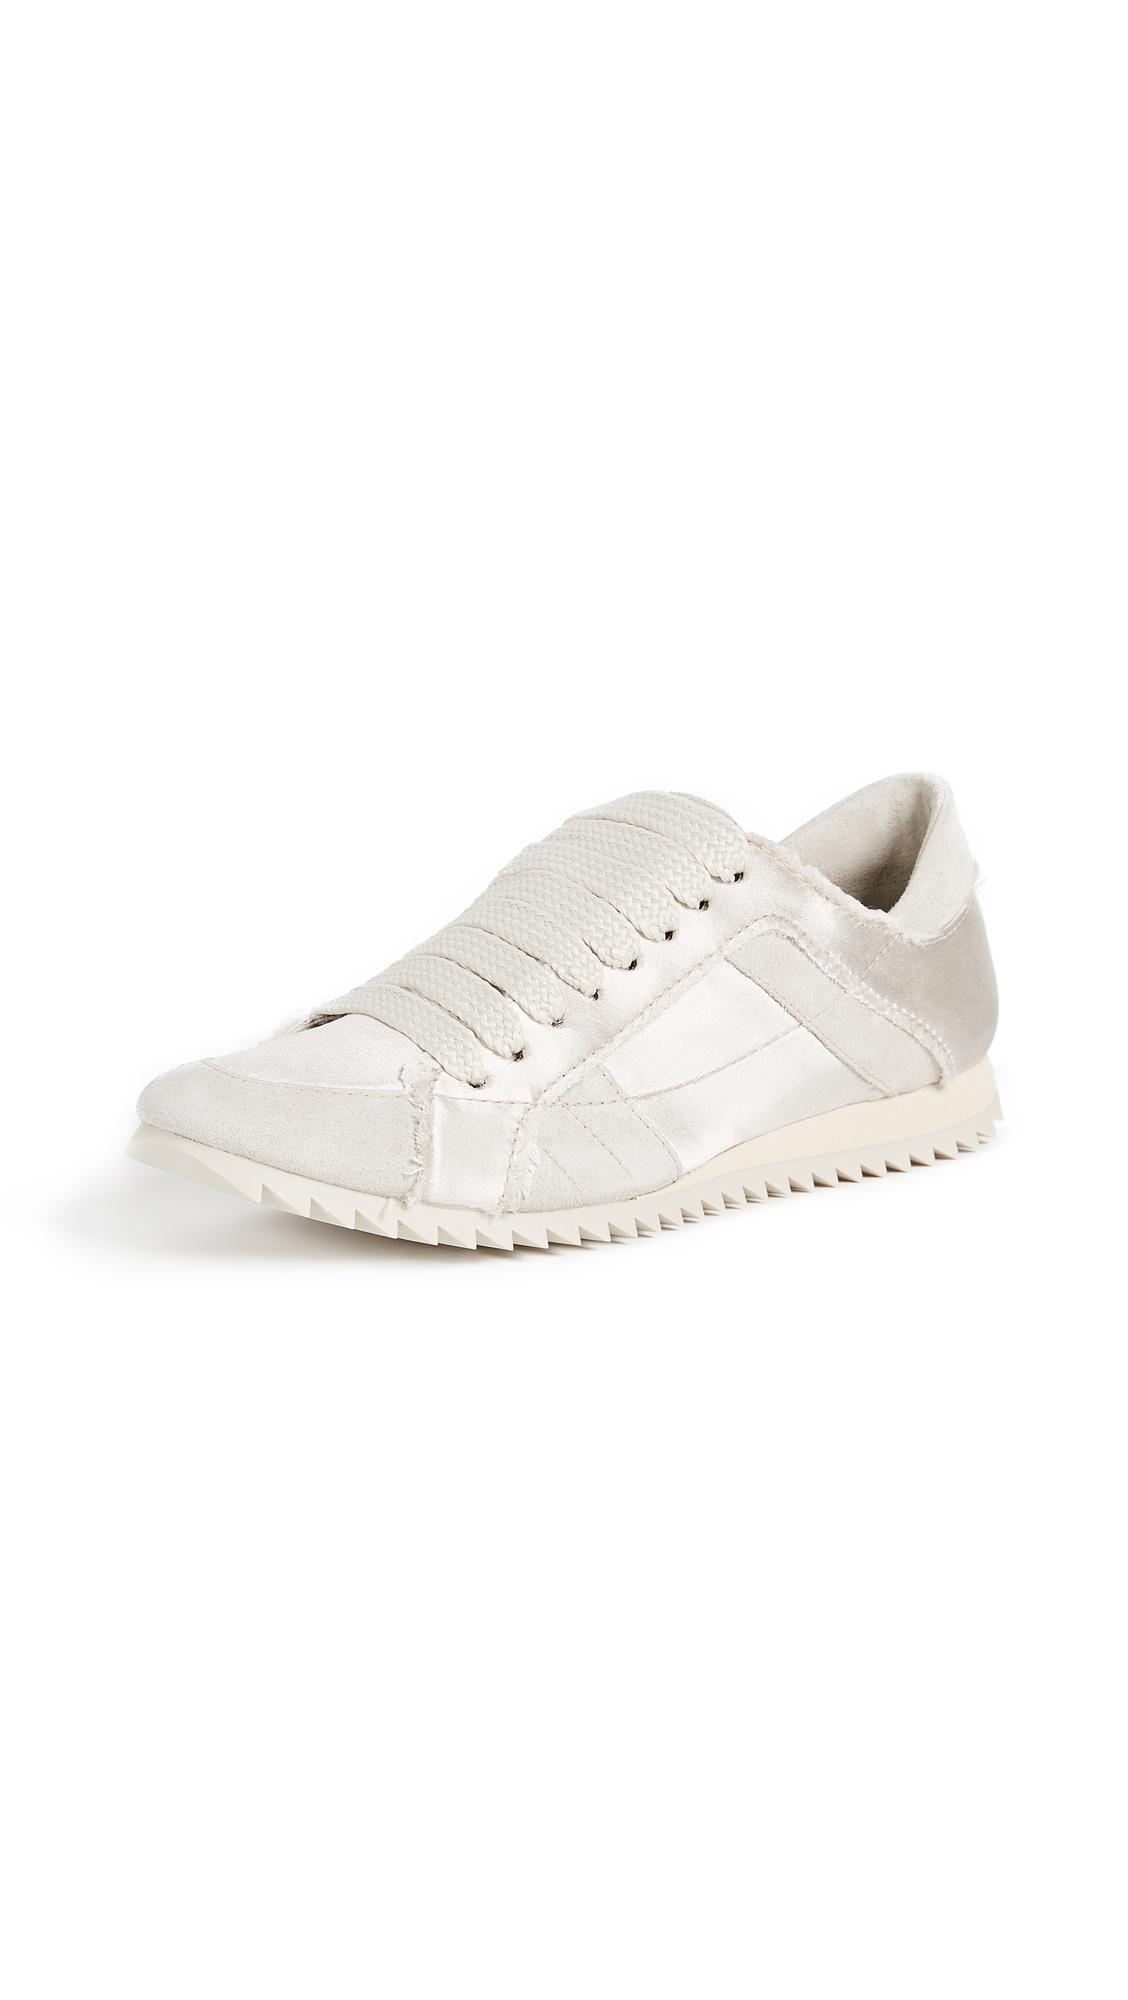 Pedro Garcia Cristina Sneakers - Pearl